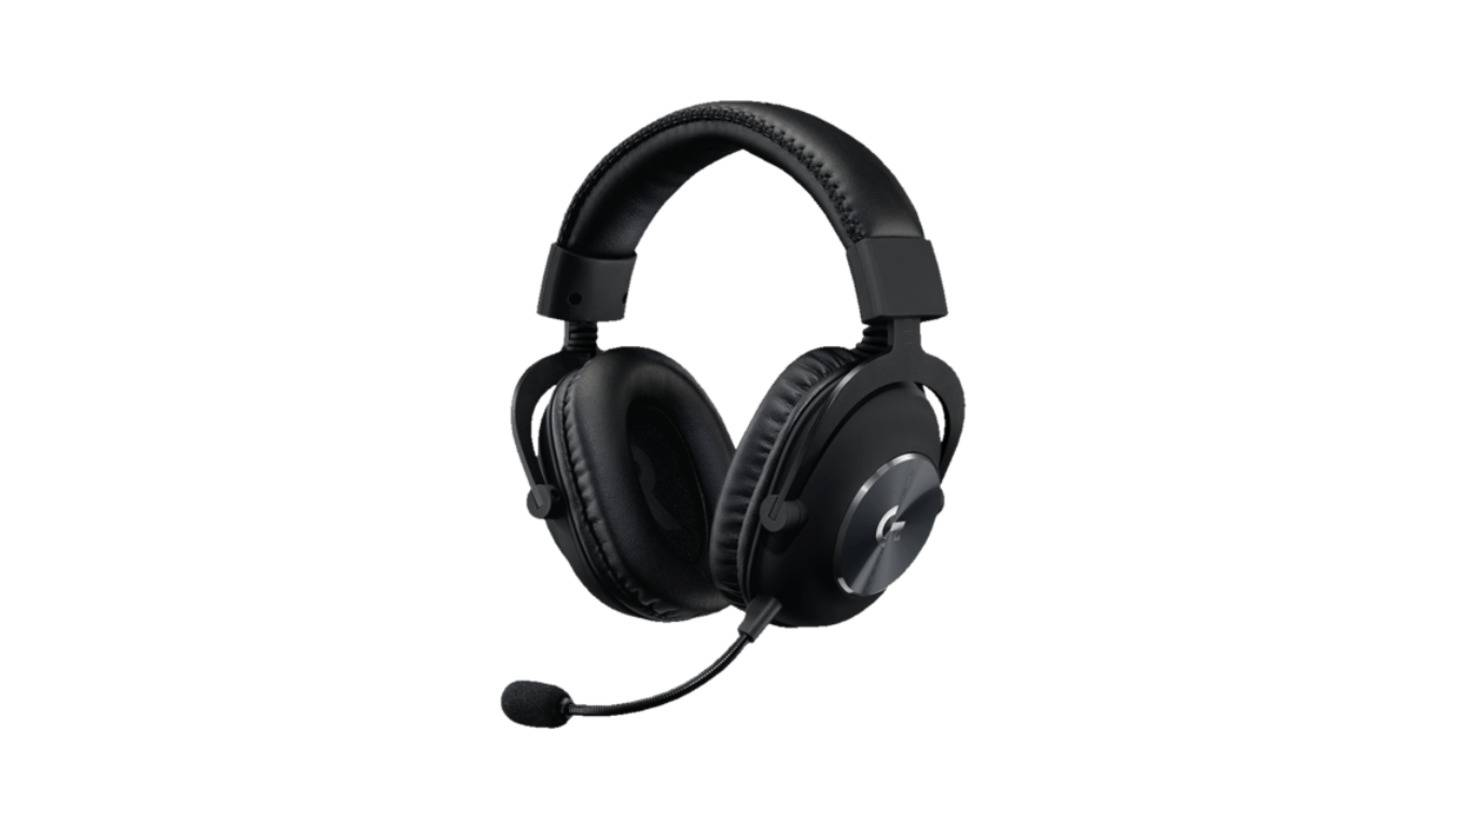 Logitech-G-Pro-X-Gaming-Headset-2